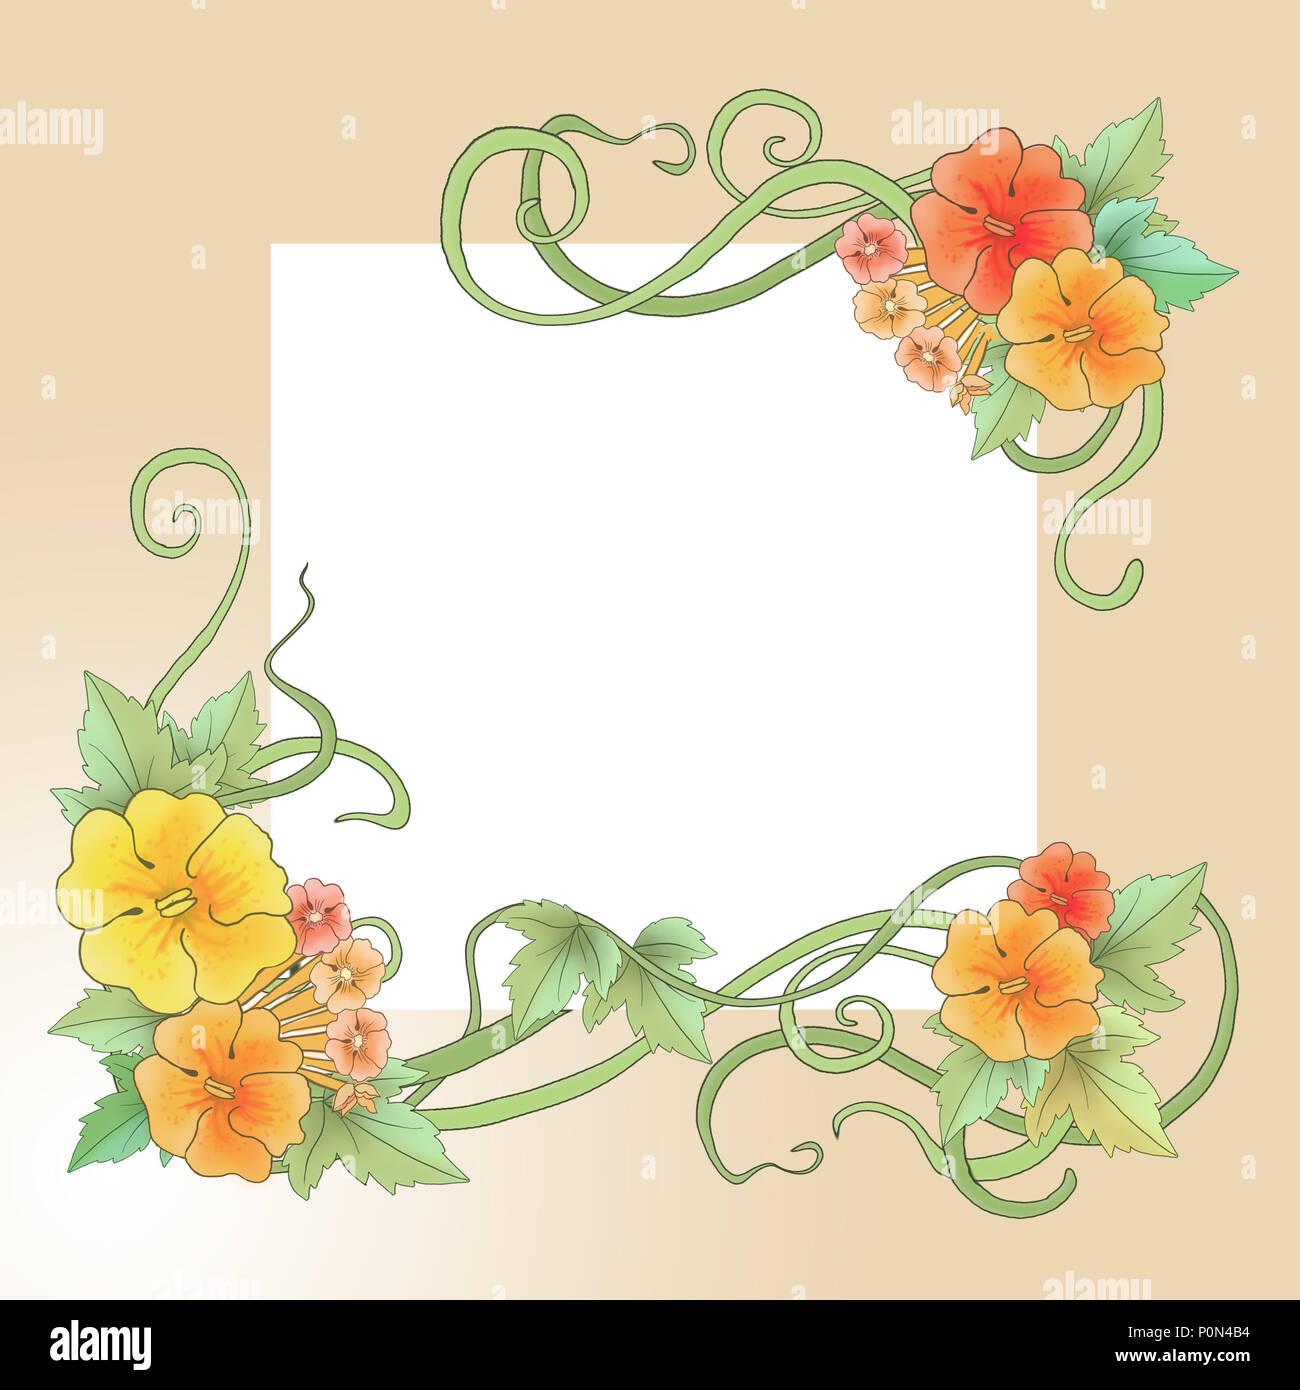 Floral Ornament In Art Nouveau Style Spring Motifs Illustrations